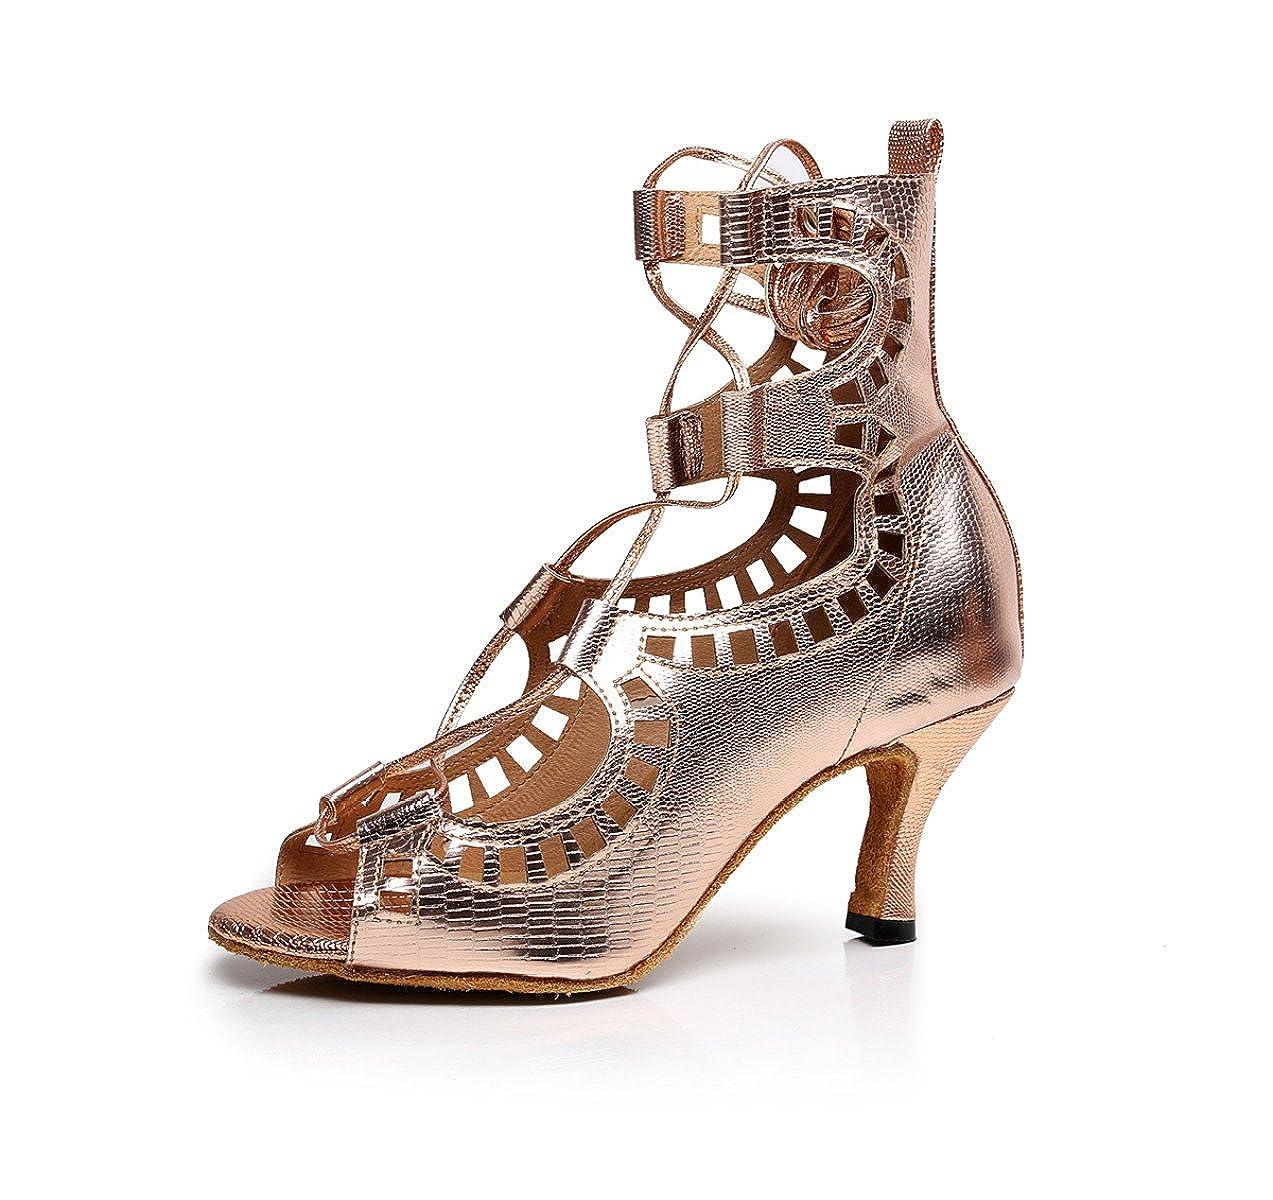 JSHOE Chaussures de Jazz Danse Salsa de Latine PU/Tango B01GWHKLWG/Thé/Samba/Moderne/Chaussures de Jazz Sandales Talons Hauts,Gold-heeled6cm-UK3.5/EU34/Our35 - f102b1e - shopssong.space